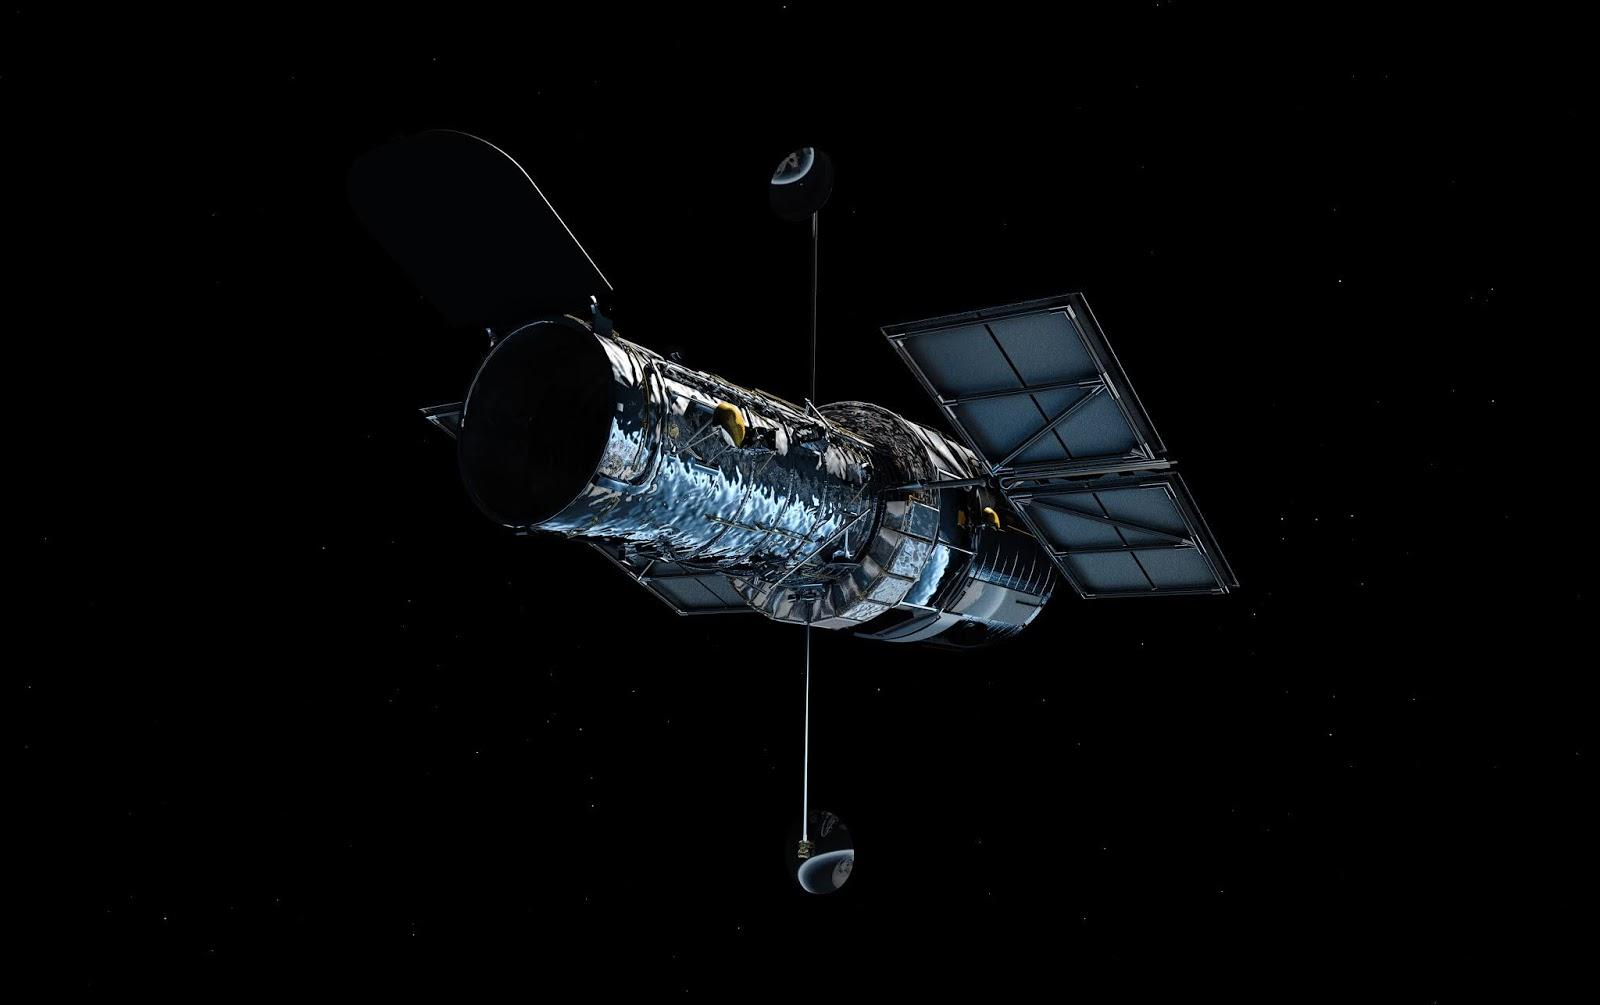 nasa building the hubble space telescope - HD1280×805